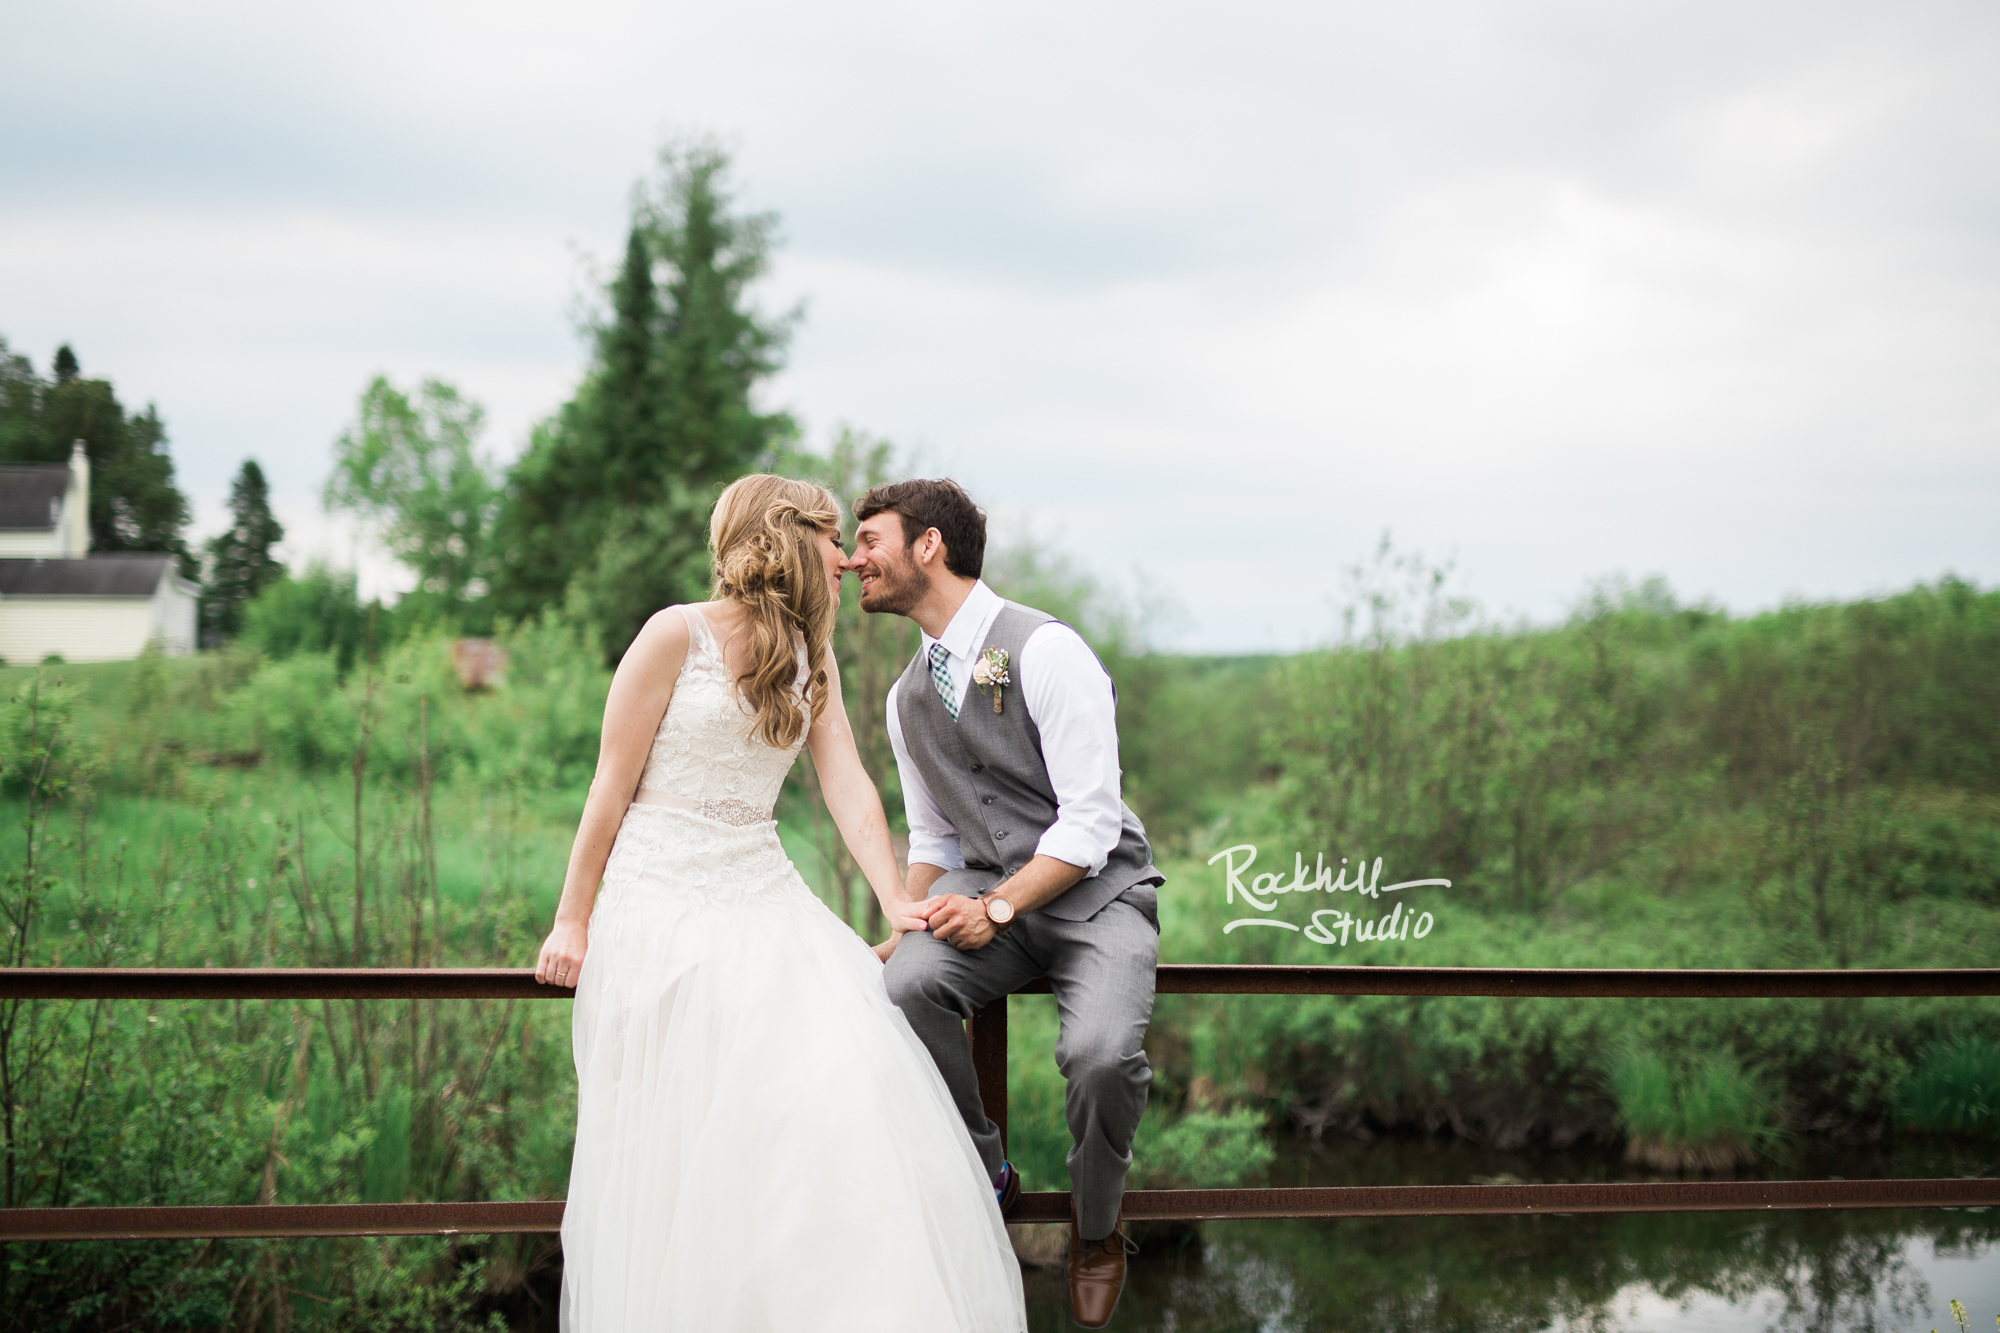 marquette-michigan-wedding-upper-peninsula-spring-photography-rockhill-ee-53.jpg